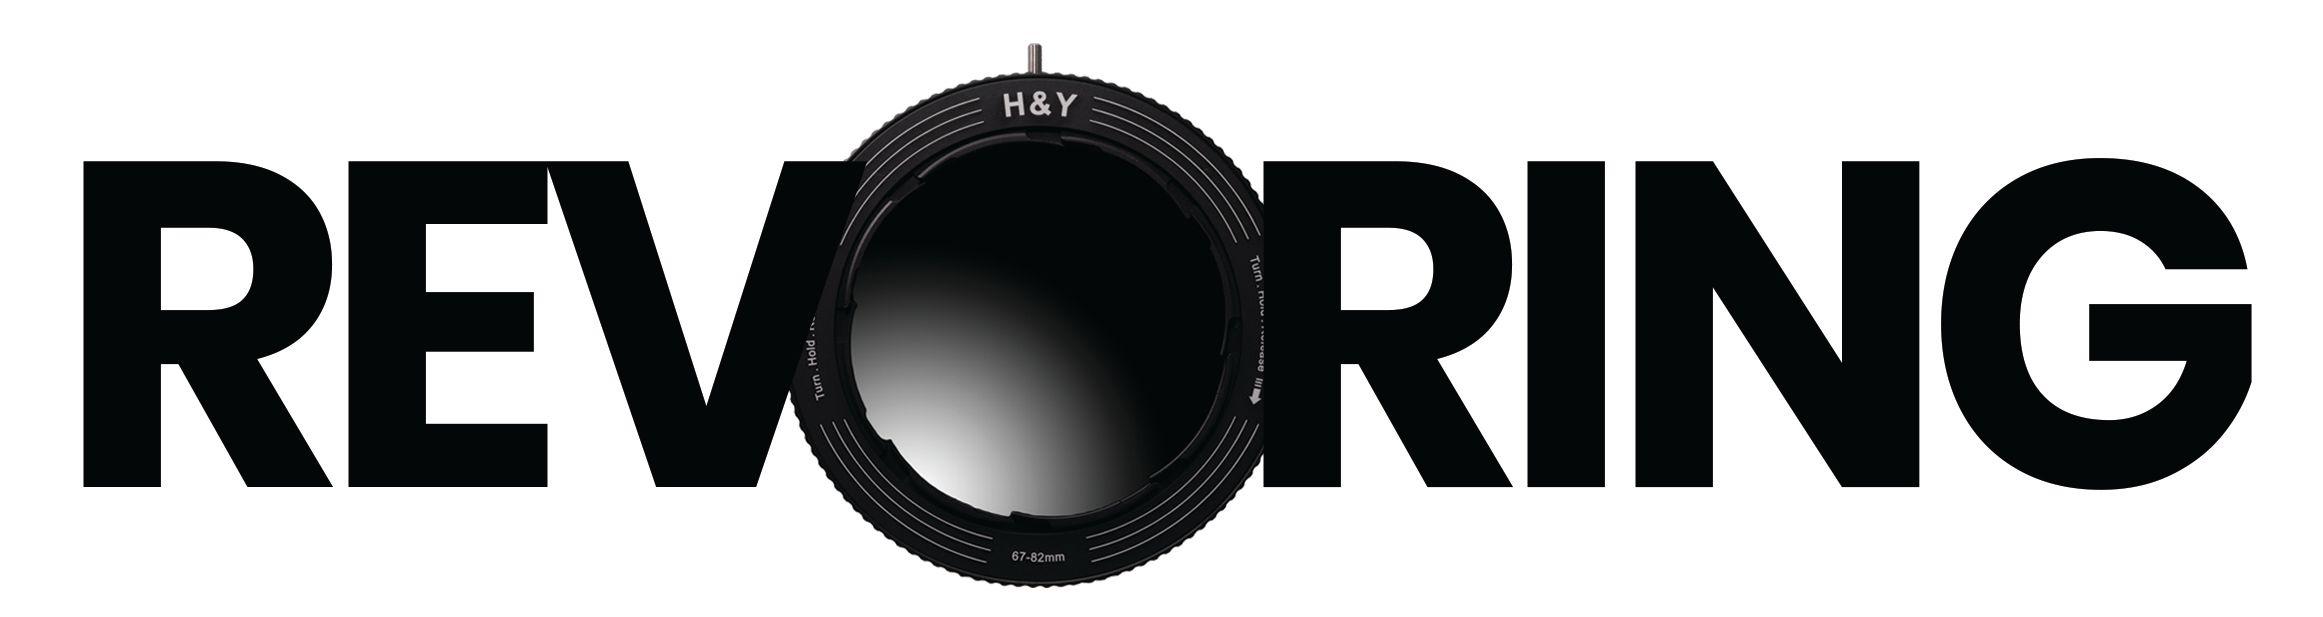 H&Y Filters